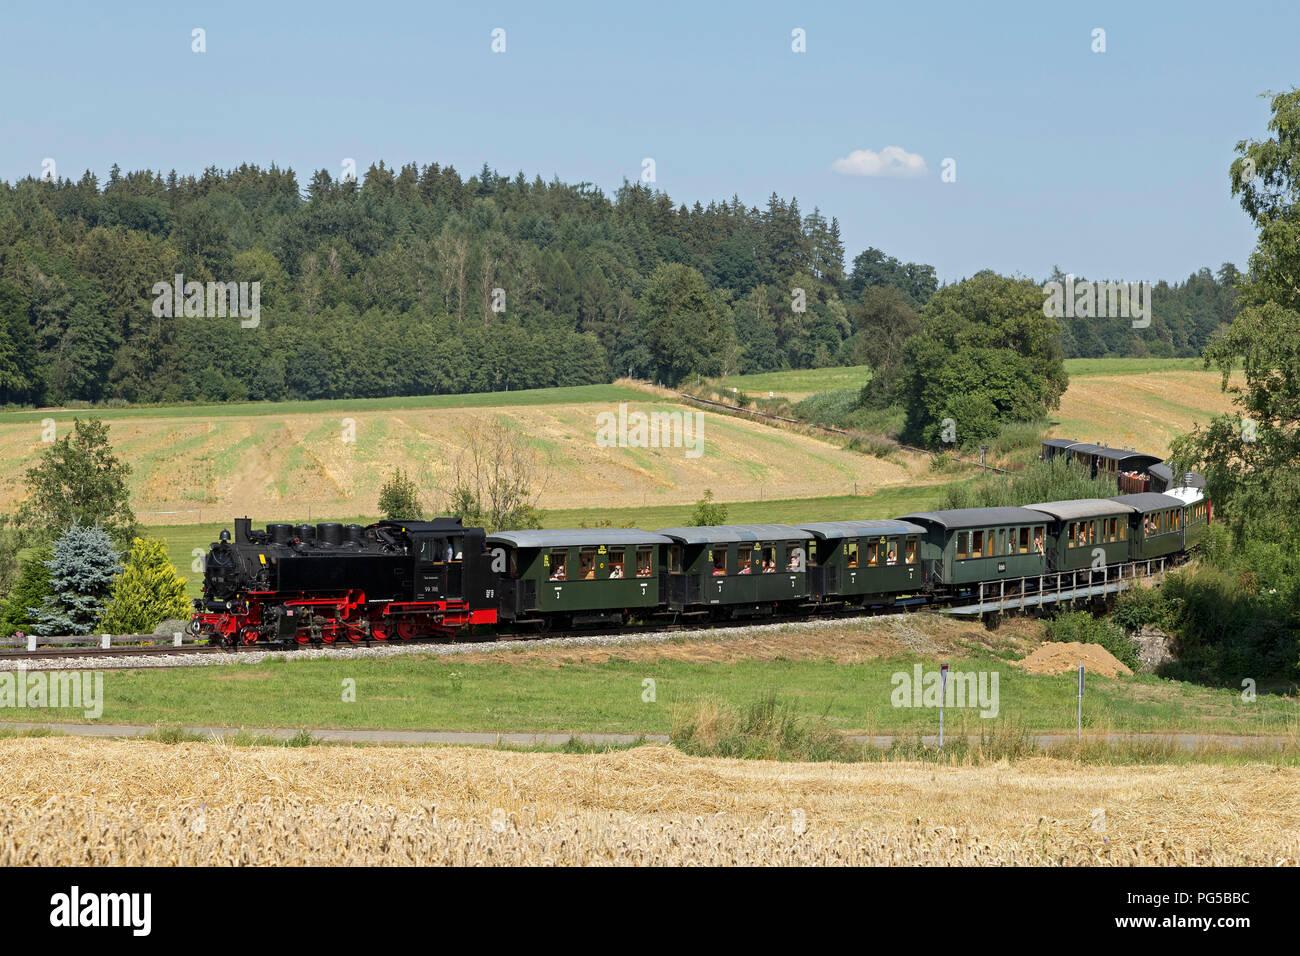 narrow-gauge railway Oechsle, Wennedach, Baden-Wuerttemberg, Germany - Stock Image